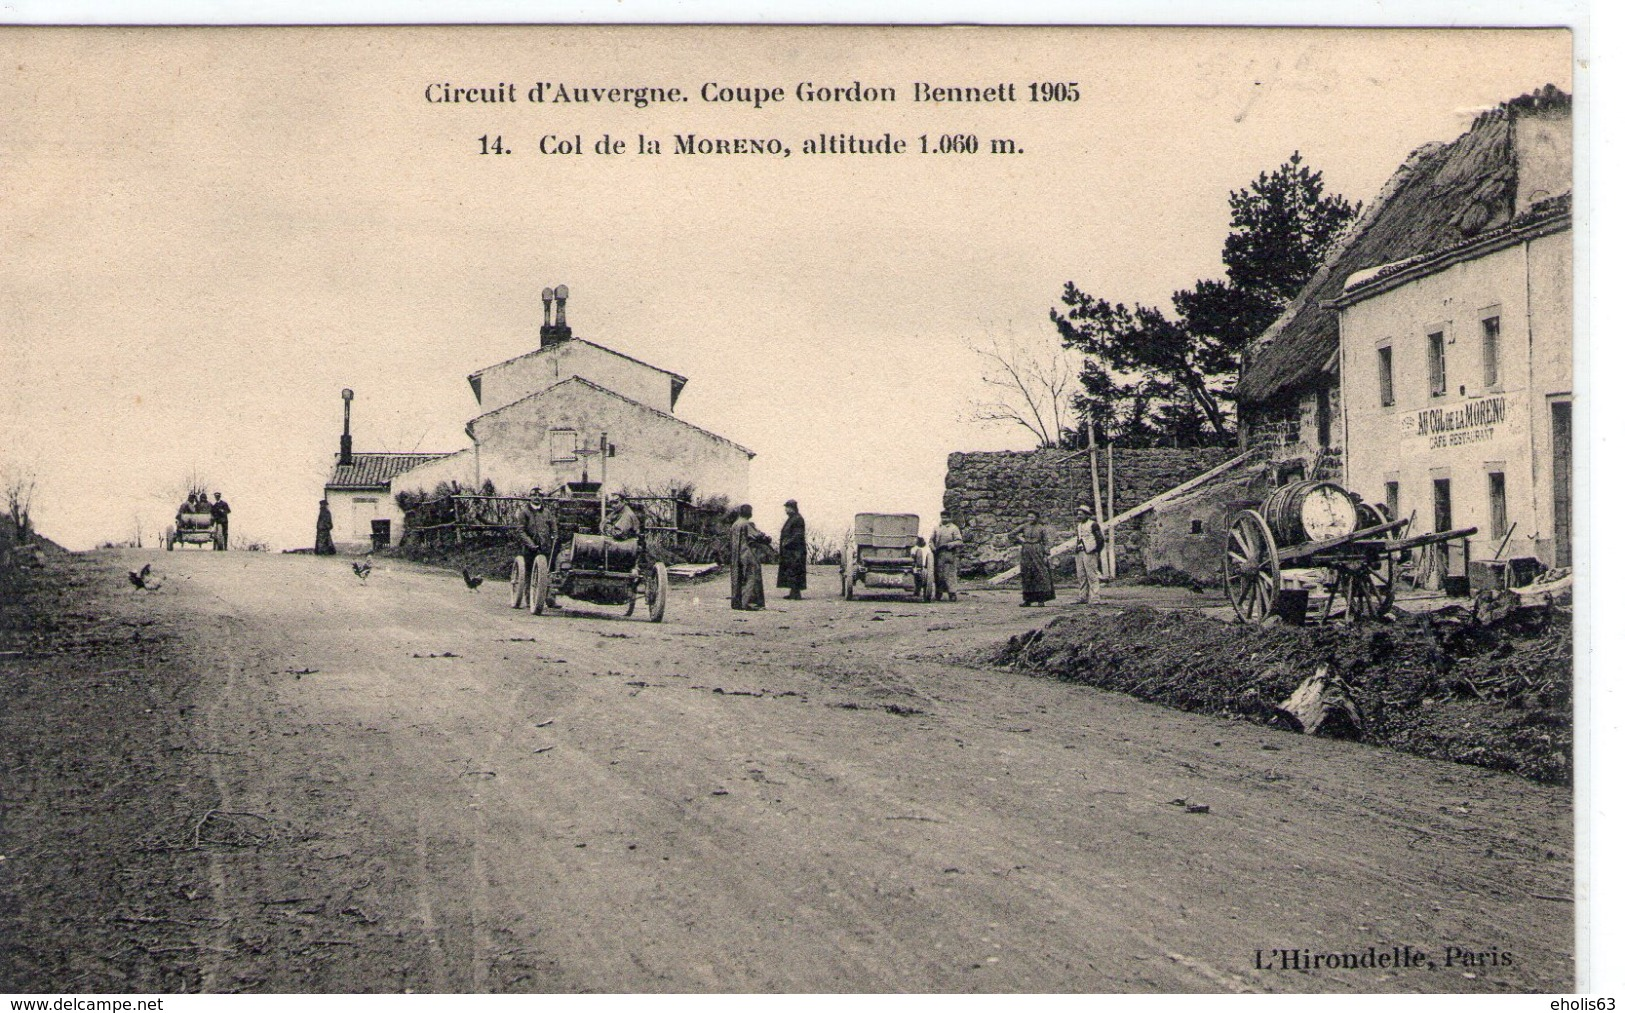 Circuit D'Auvergne - Coupe Gordon Bennett 1905 - COL DE LA MORENO 14 - TBE+ - Sport Automobile